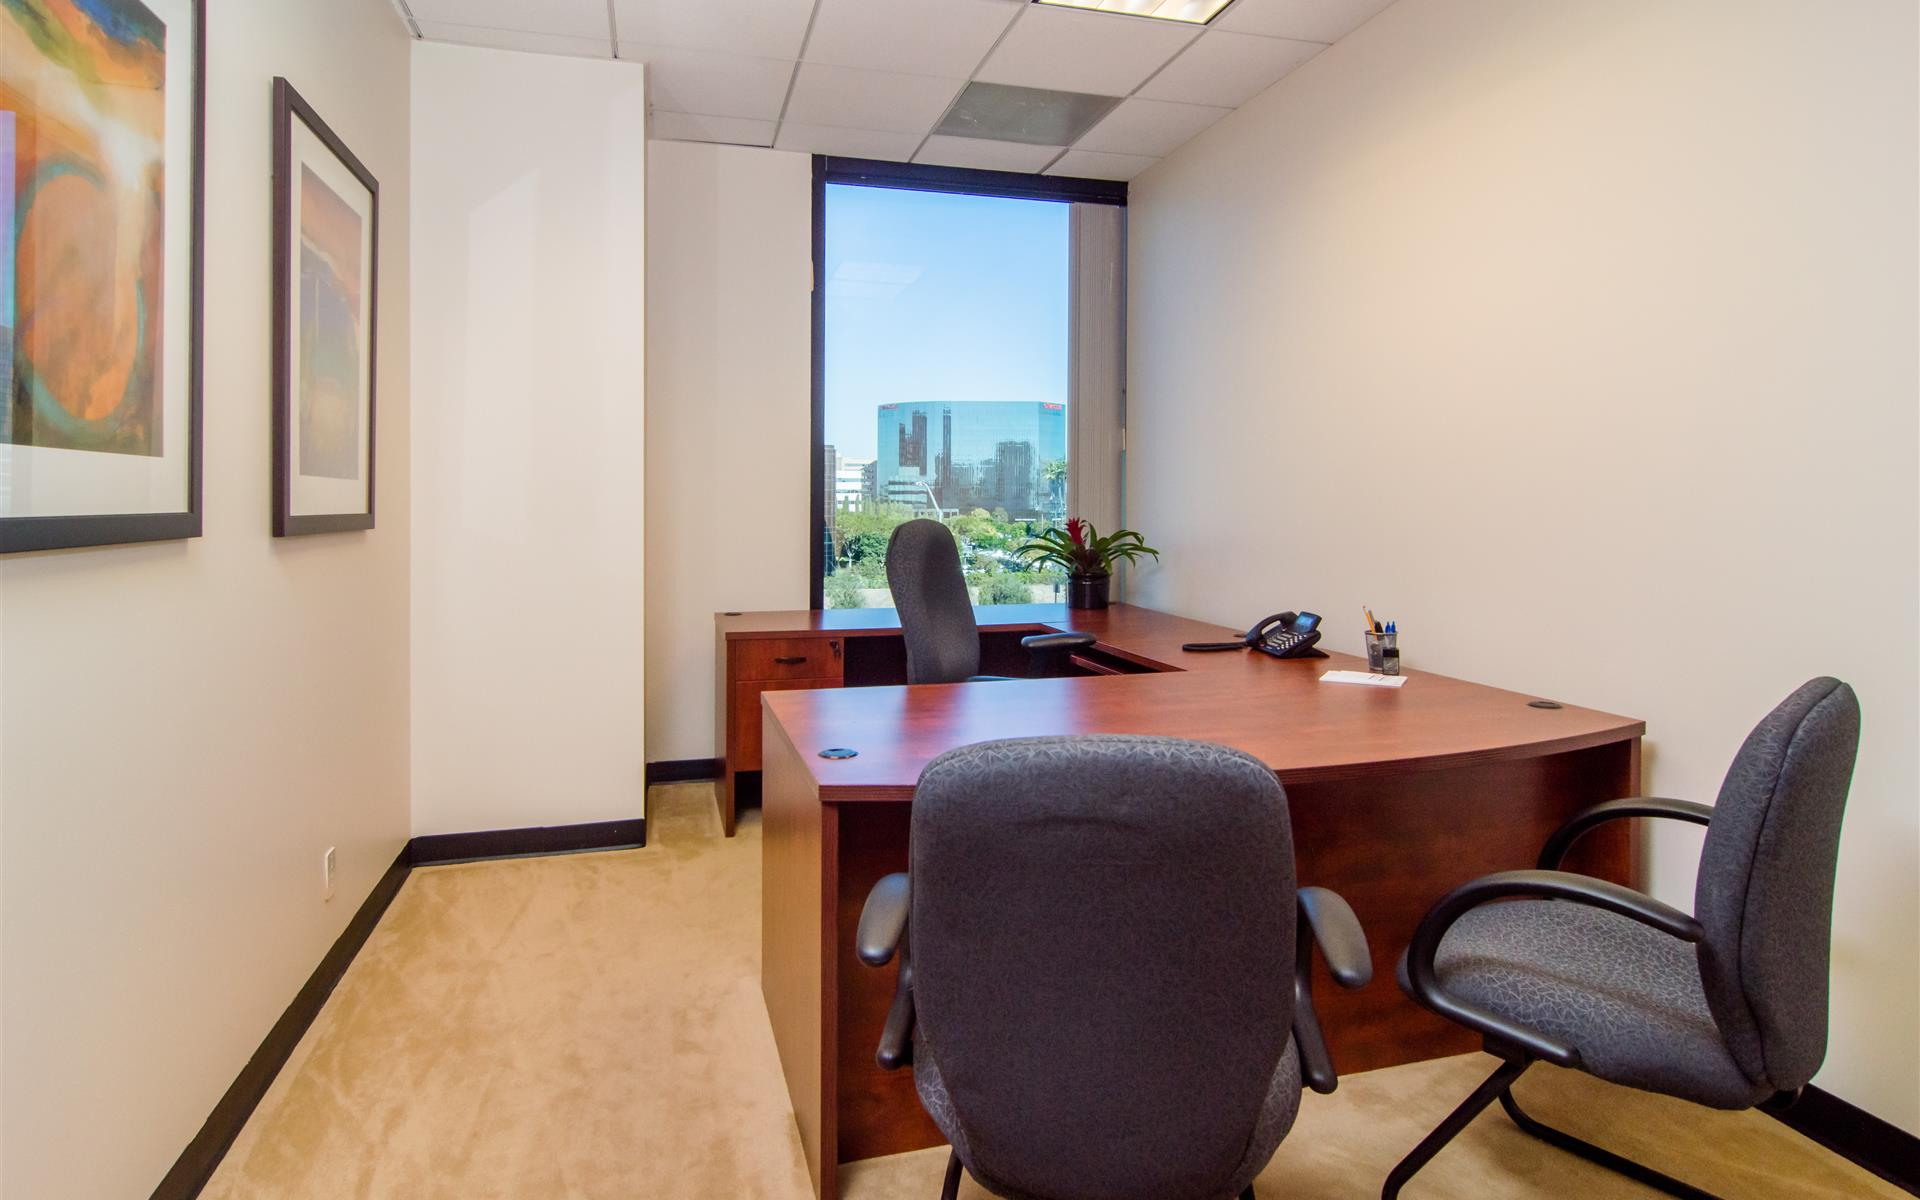 (LAK) Lakeshore Tower - Beautiful Window Office